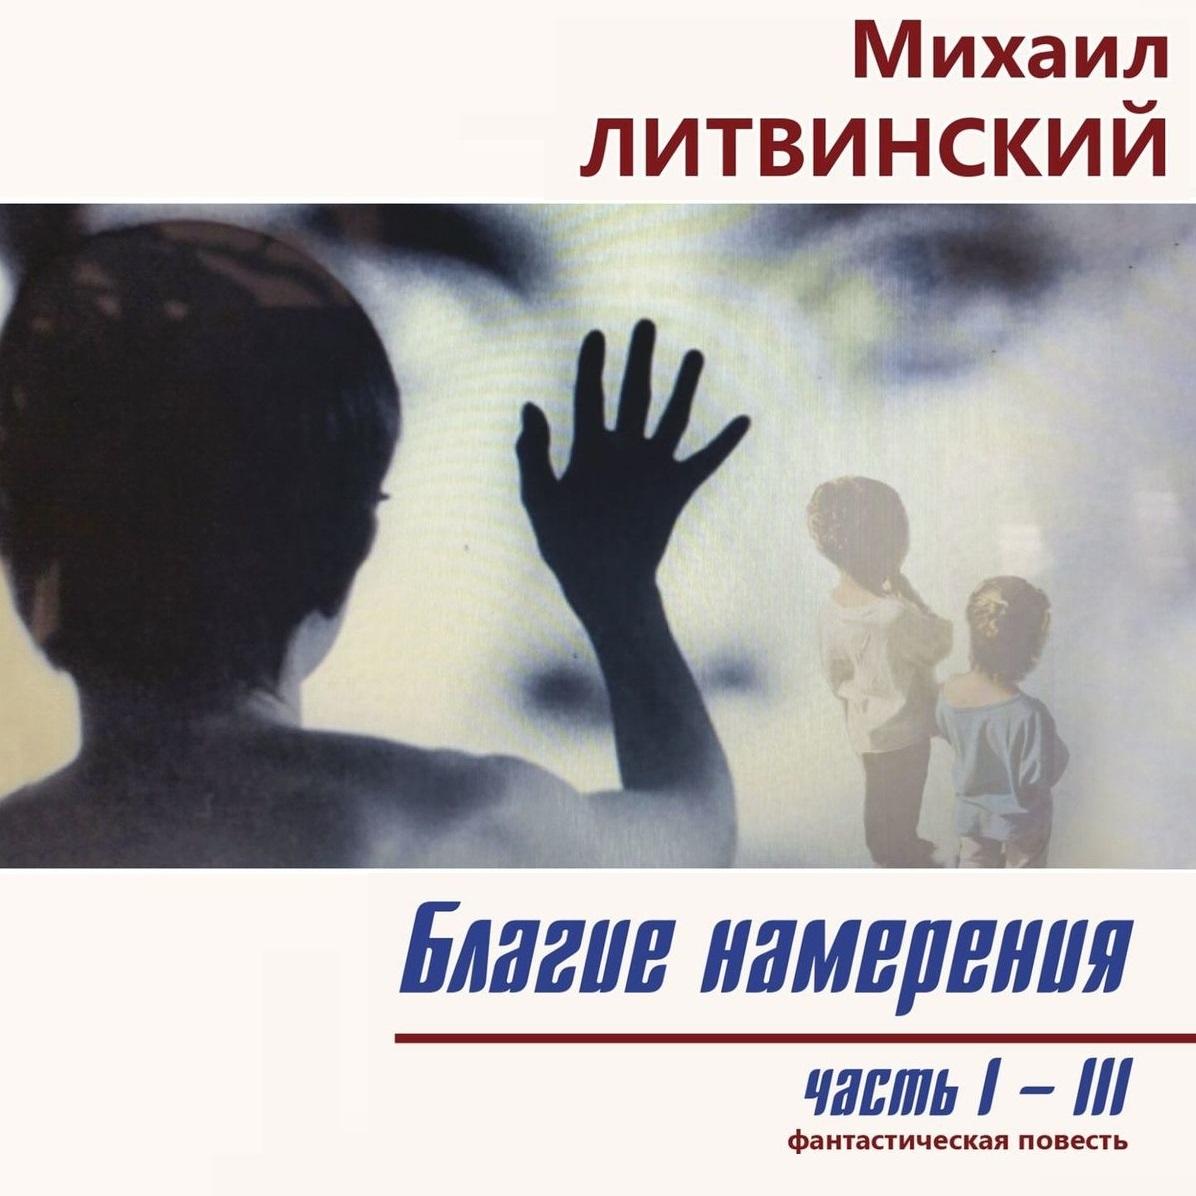 Михаил Литвинский Благие намерения. Части I–III наталия антонова благие намерения